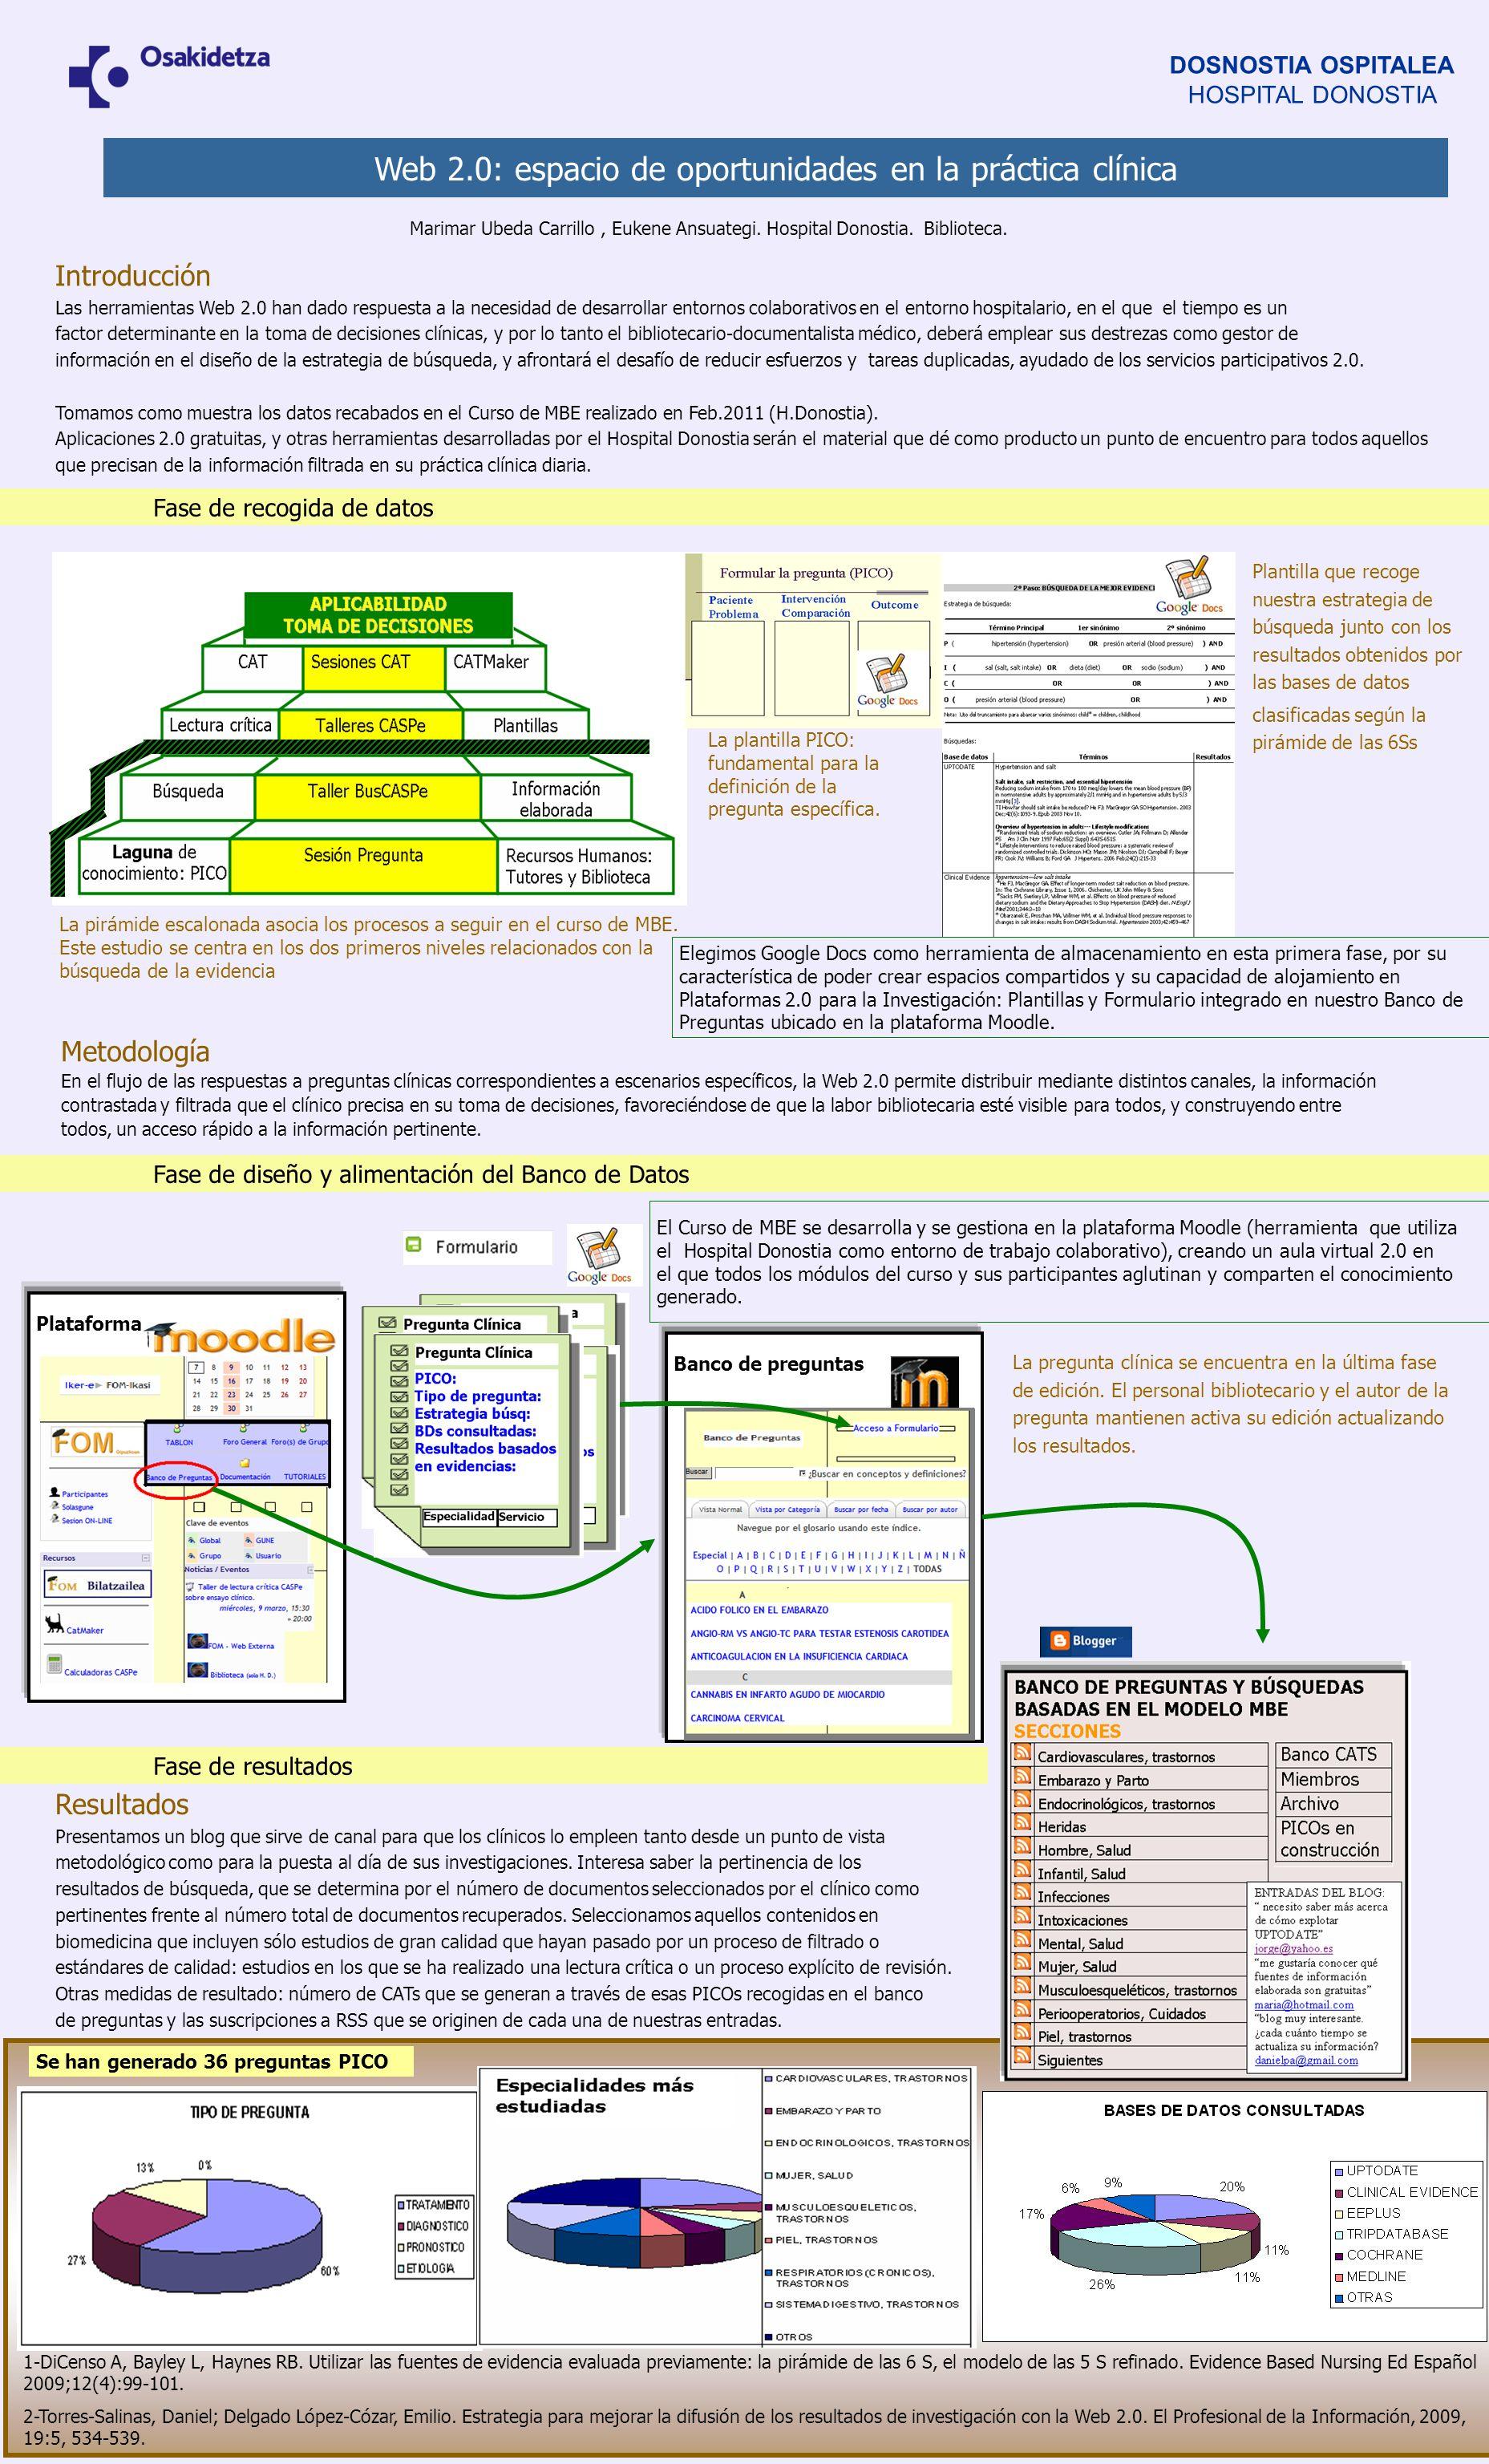 DOSNOSTIA OSPITALEA HOSPITAL DONOSTIA Web 2.0: espacio de oportunidades en la práctica clínica Marimar Ubeda Carrillo, Eukene Ansuategi. Hospital Dono